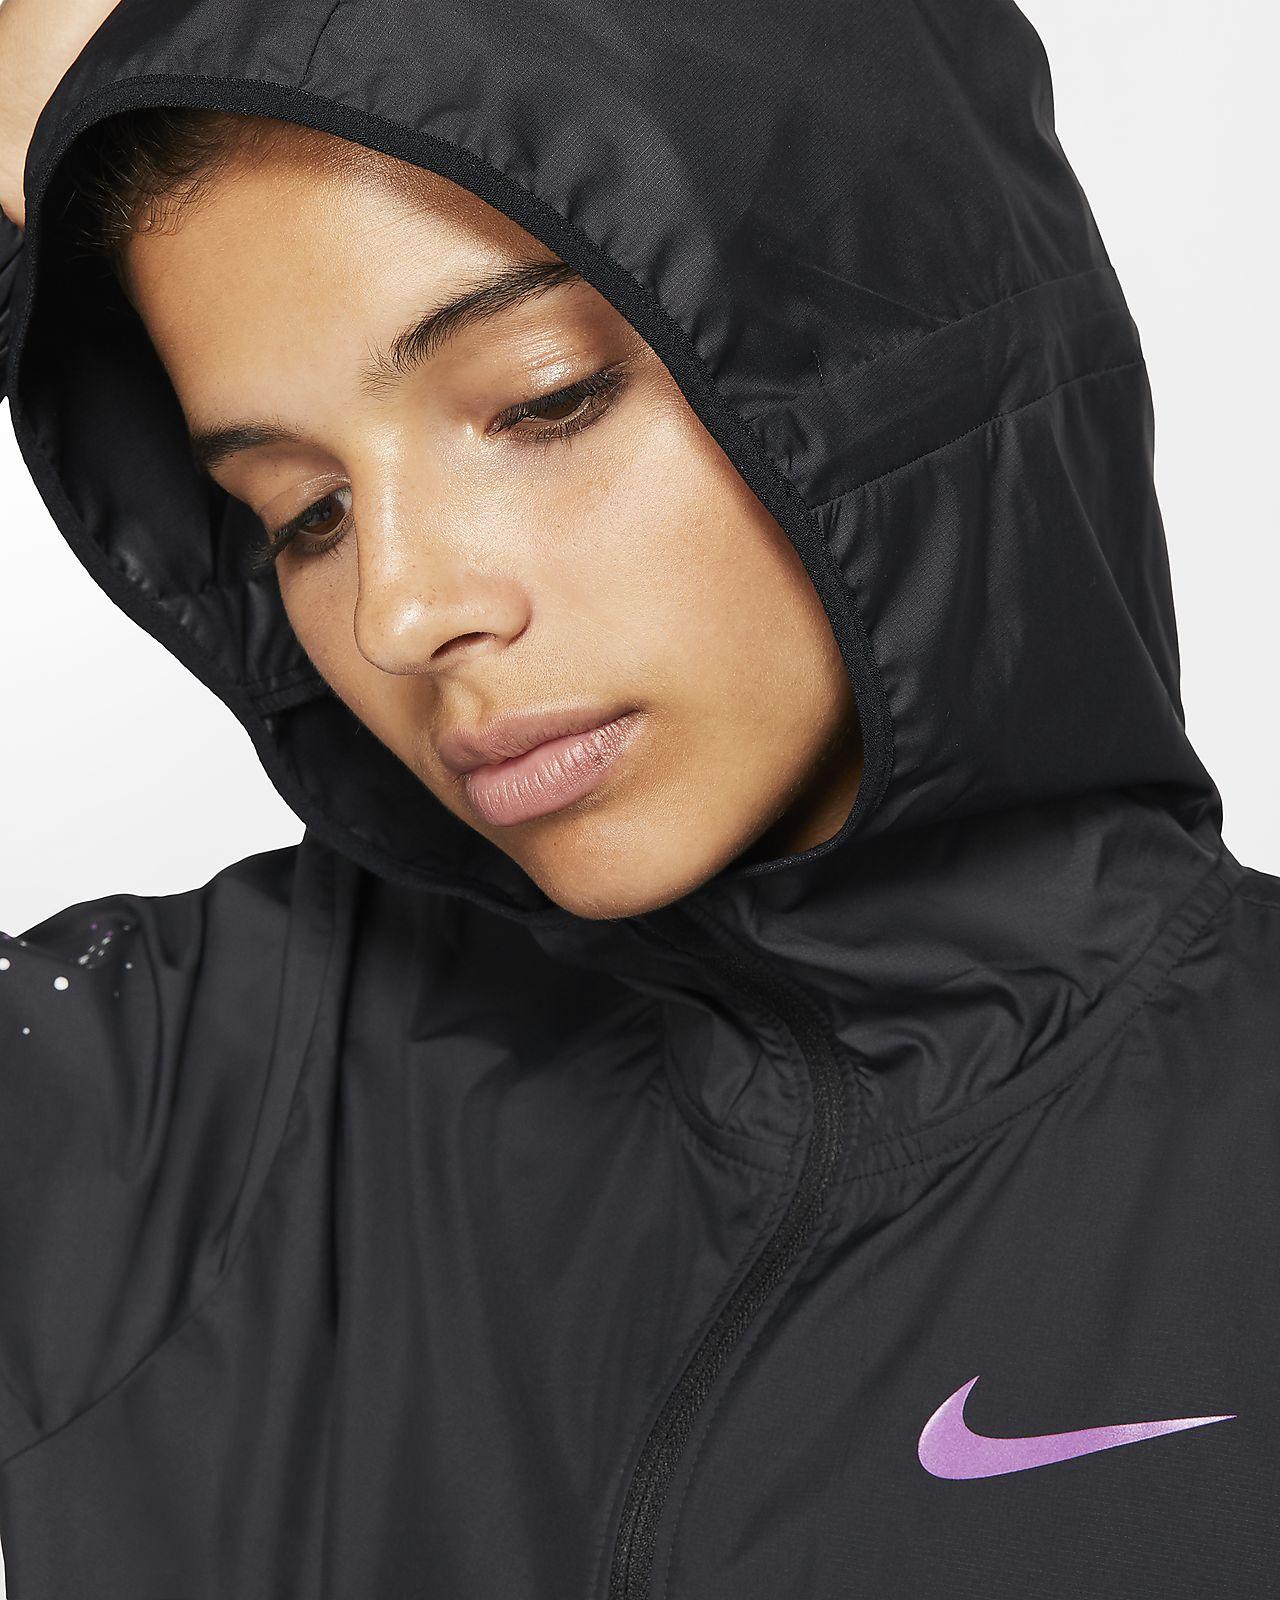 Nike Damen Laufjacke mit durchgehendem Reißverschluss